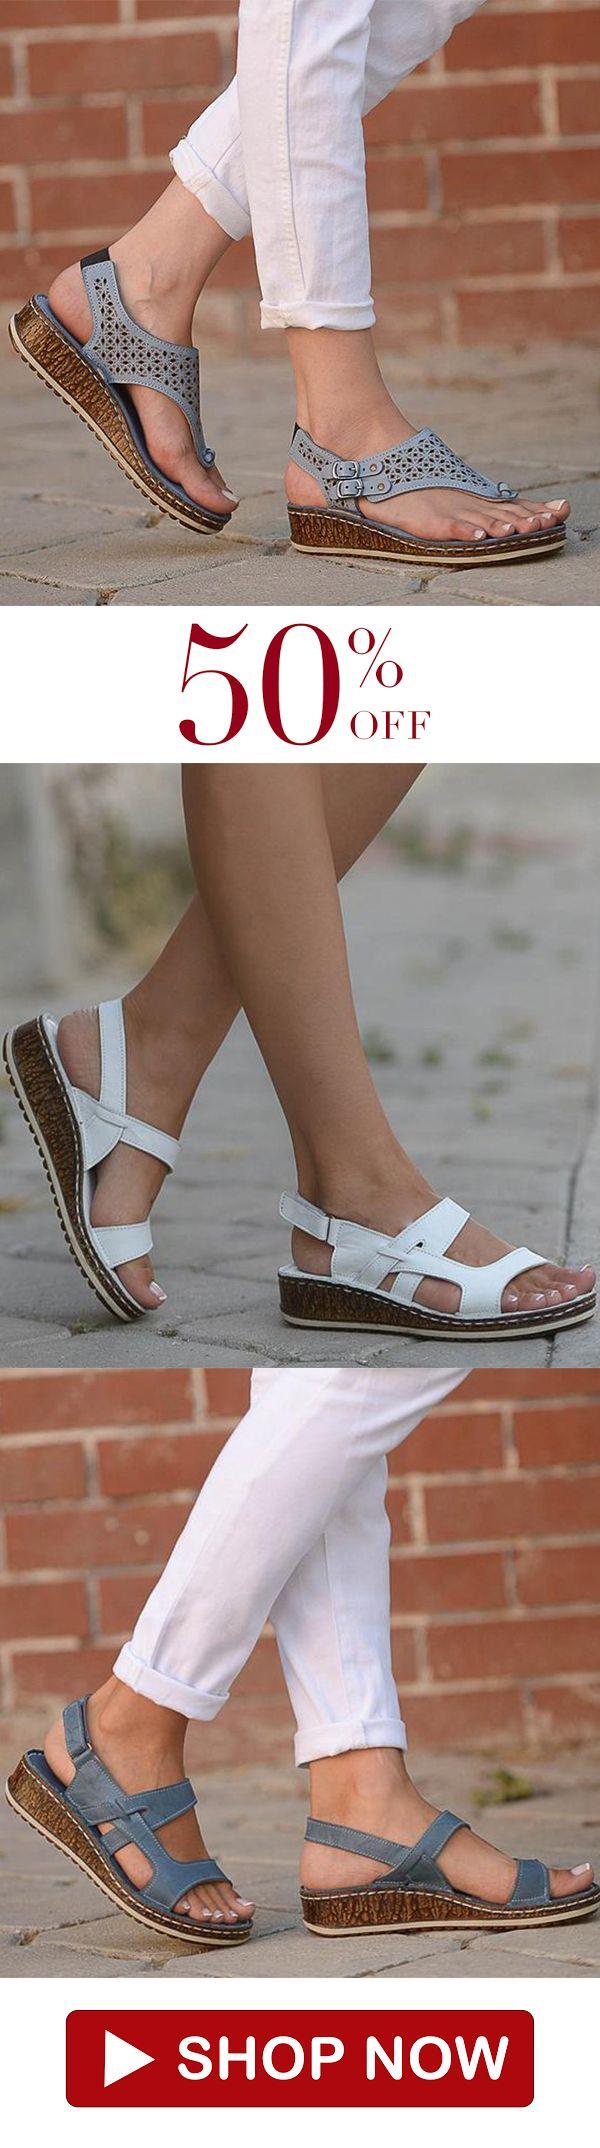 e27747d12 Women Casual Summer Wedge Sandals | Sandals in 2019 | Summer wedges ...